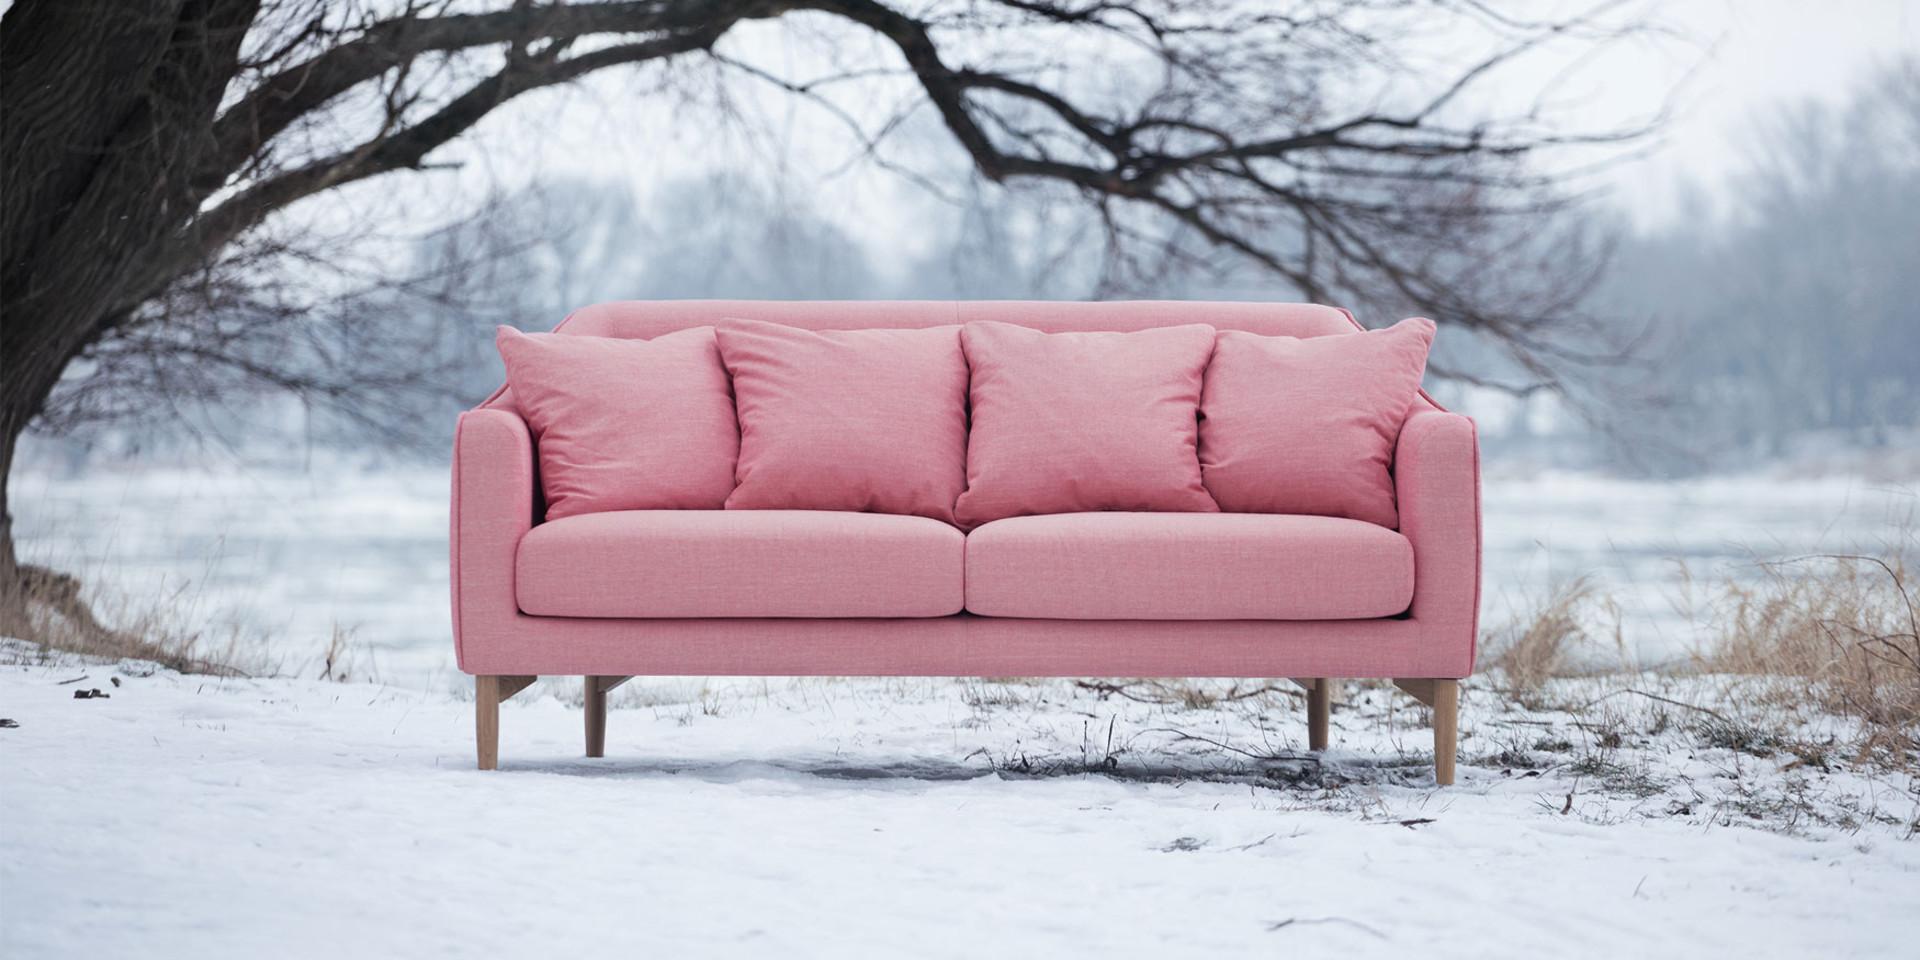 sits-ivy-ambiance-arrangement_25seater_lila9_watermelon_3